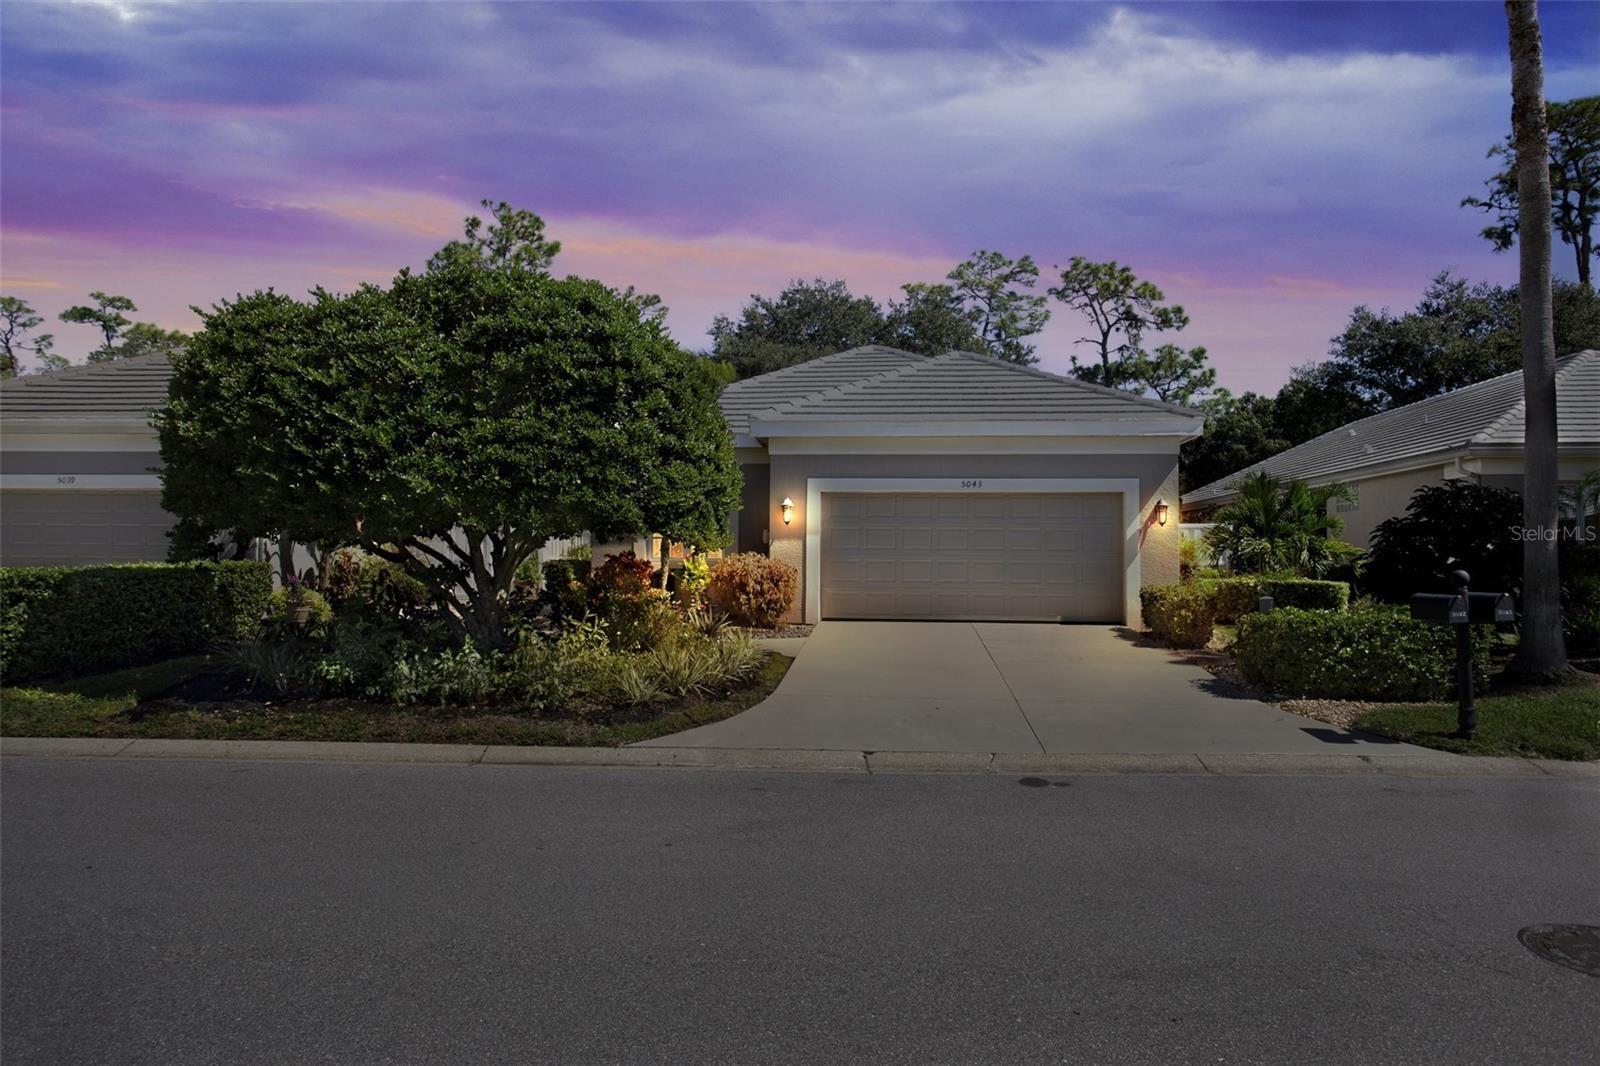 Photo of 5043 88TH STREET E, BRADENTON, FL 34211 (MLS # O5980124)